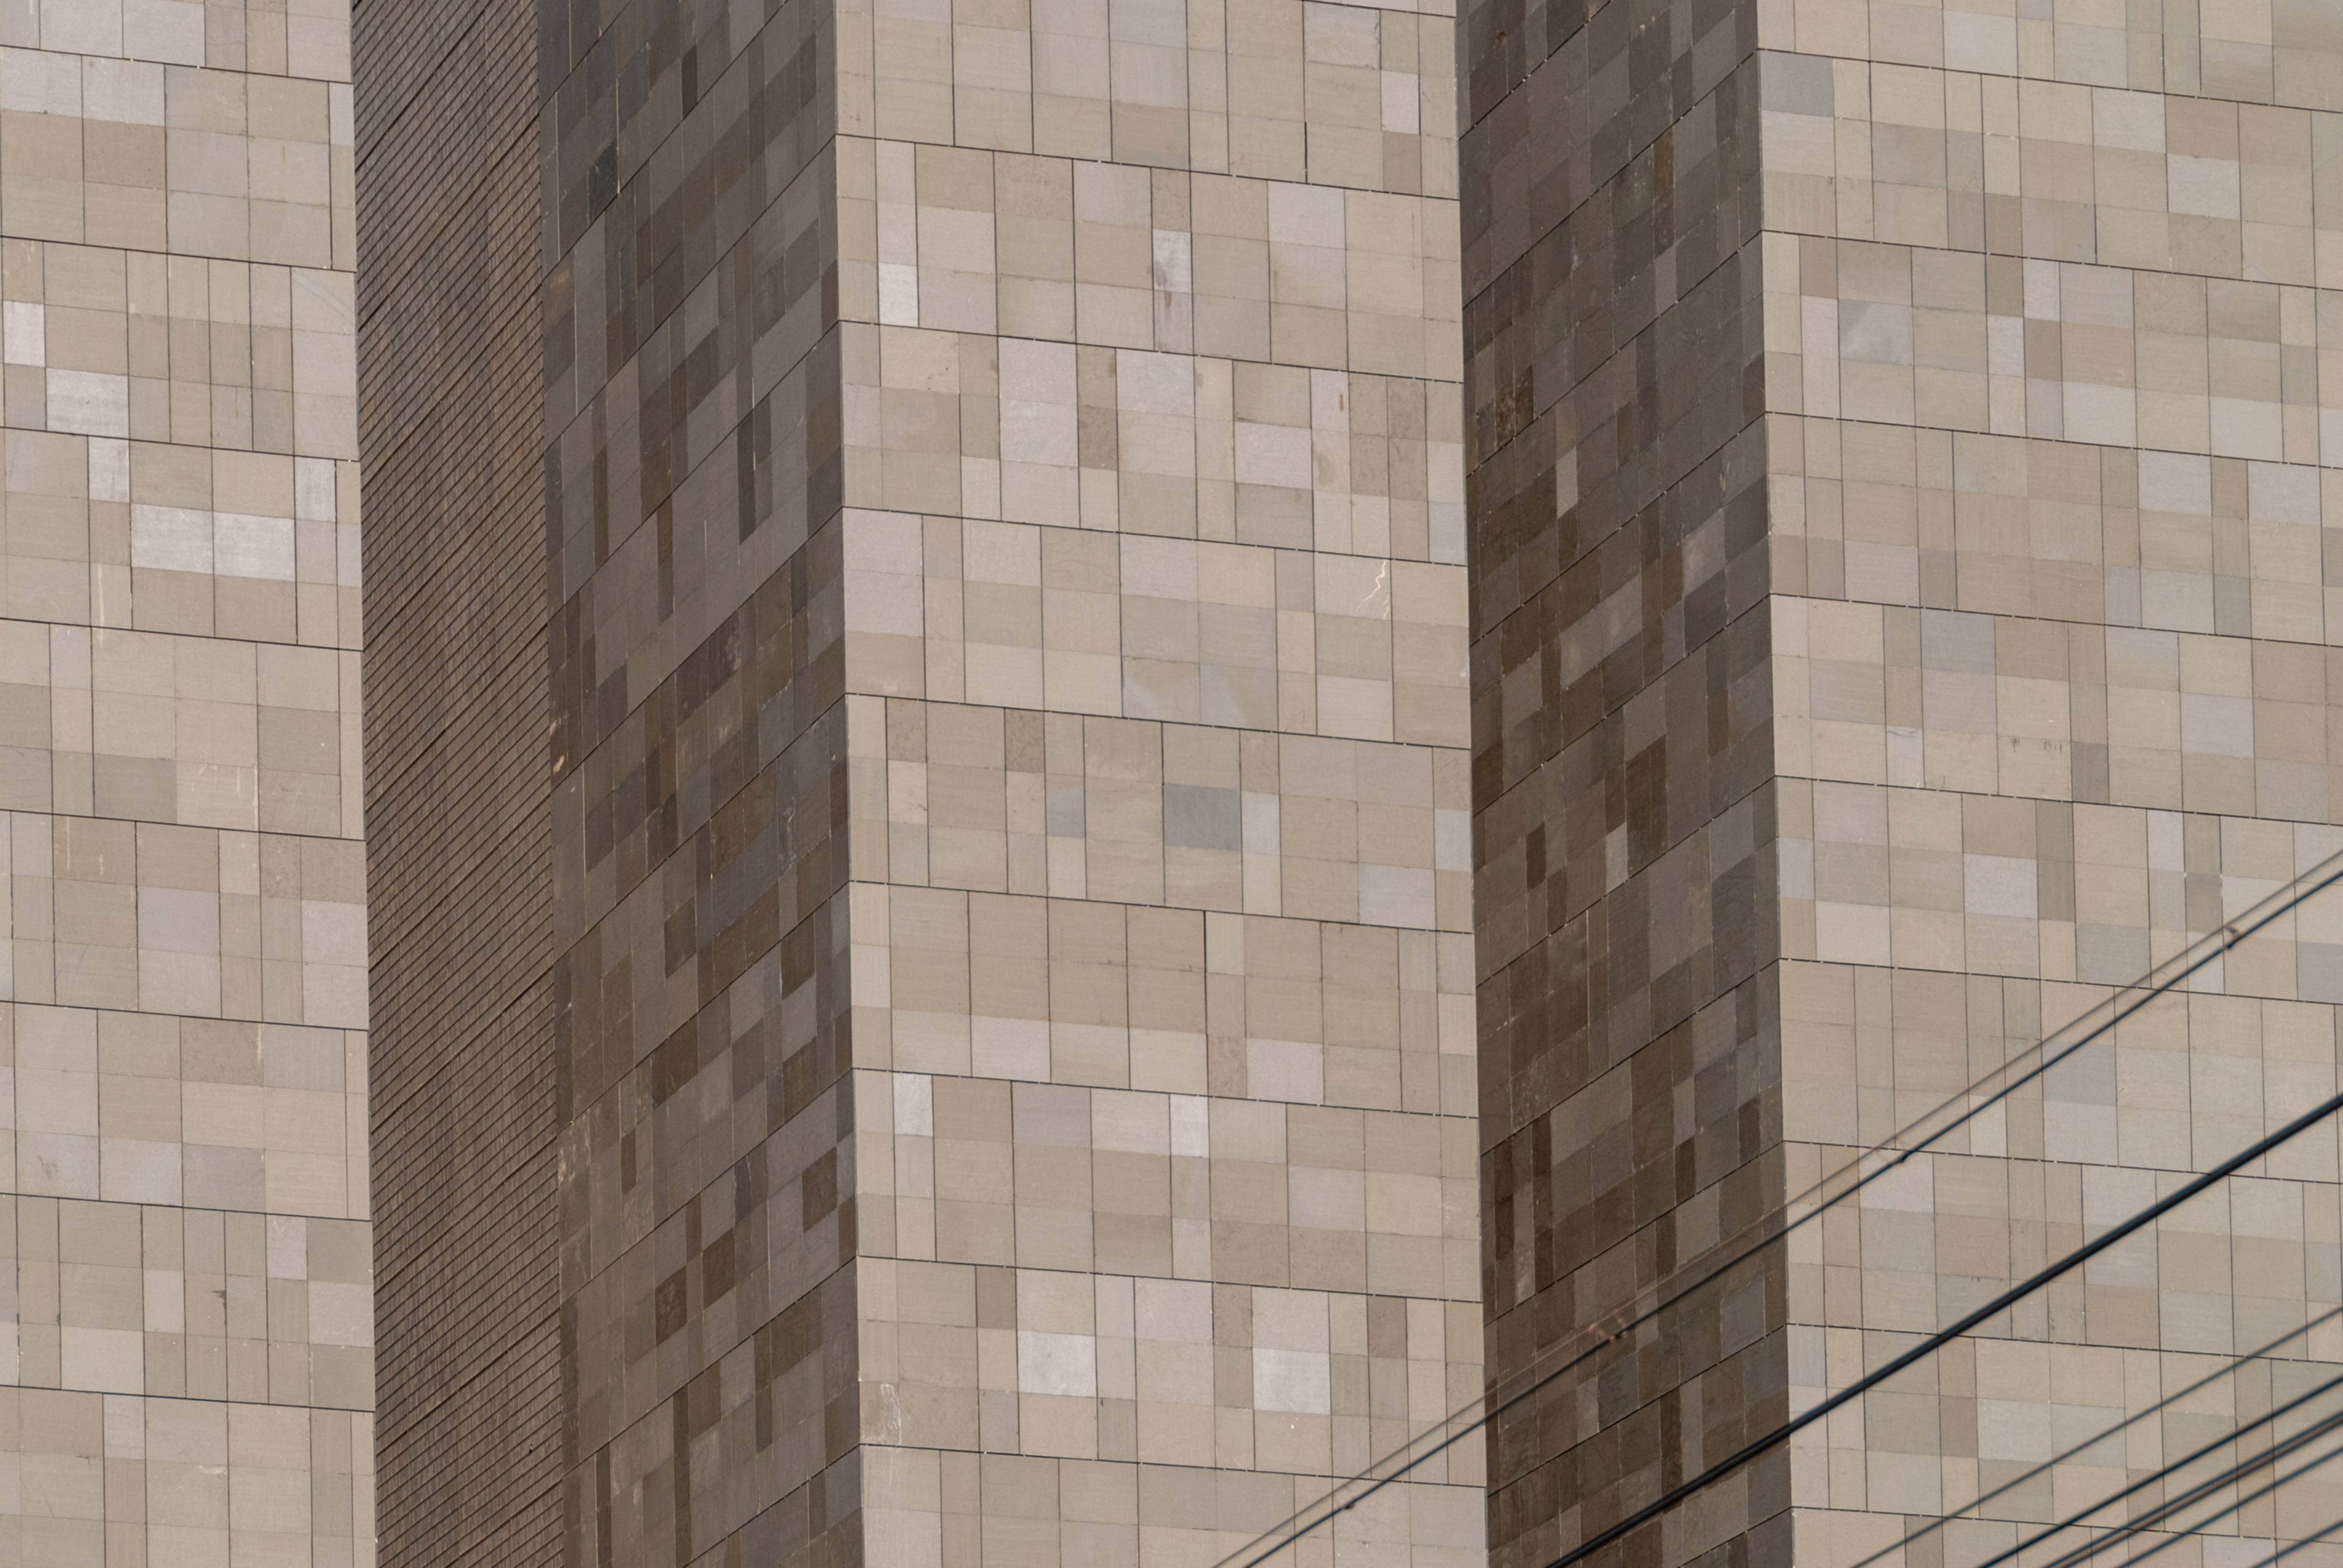 The Digital Beijing Building close-up